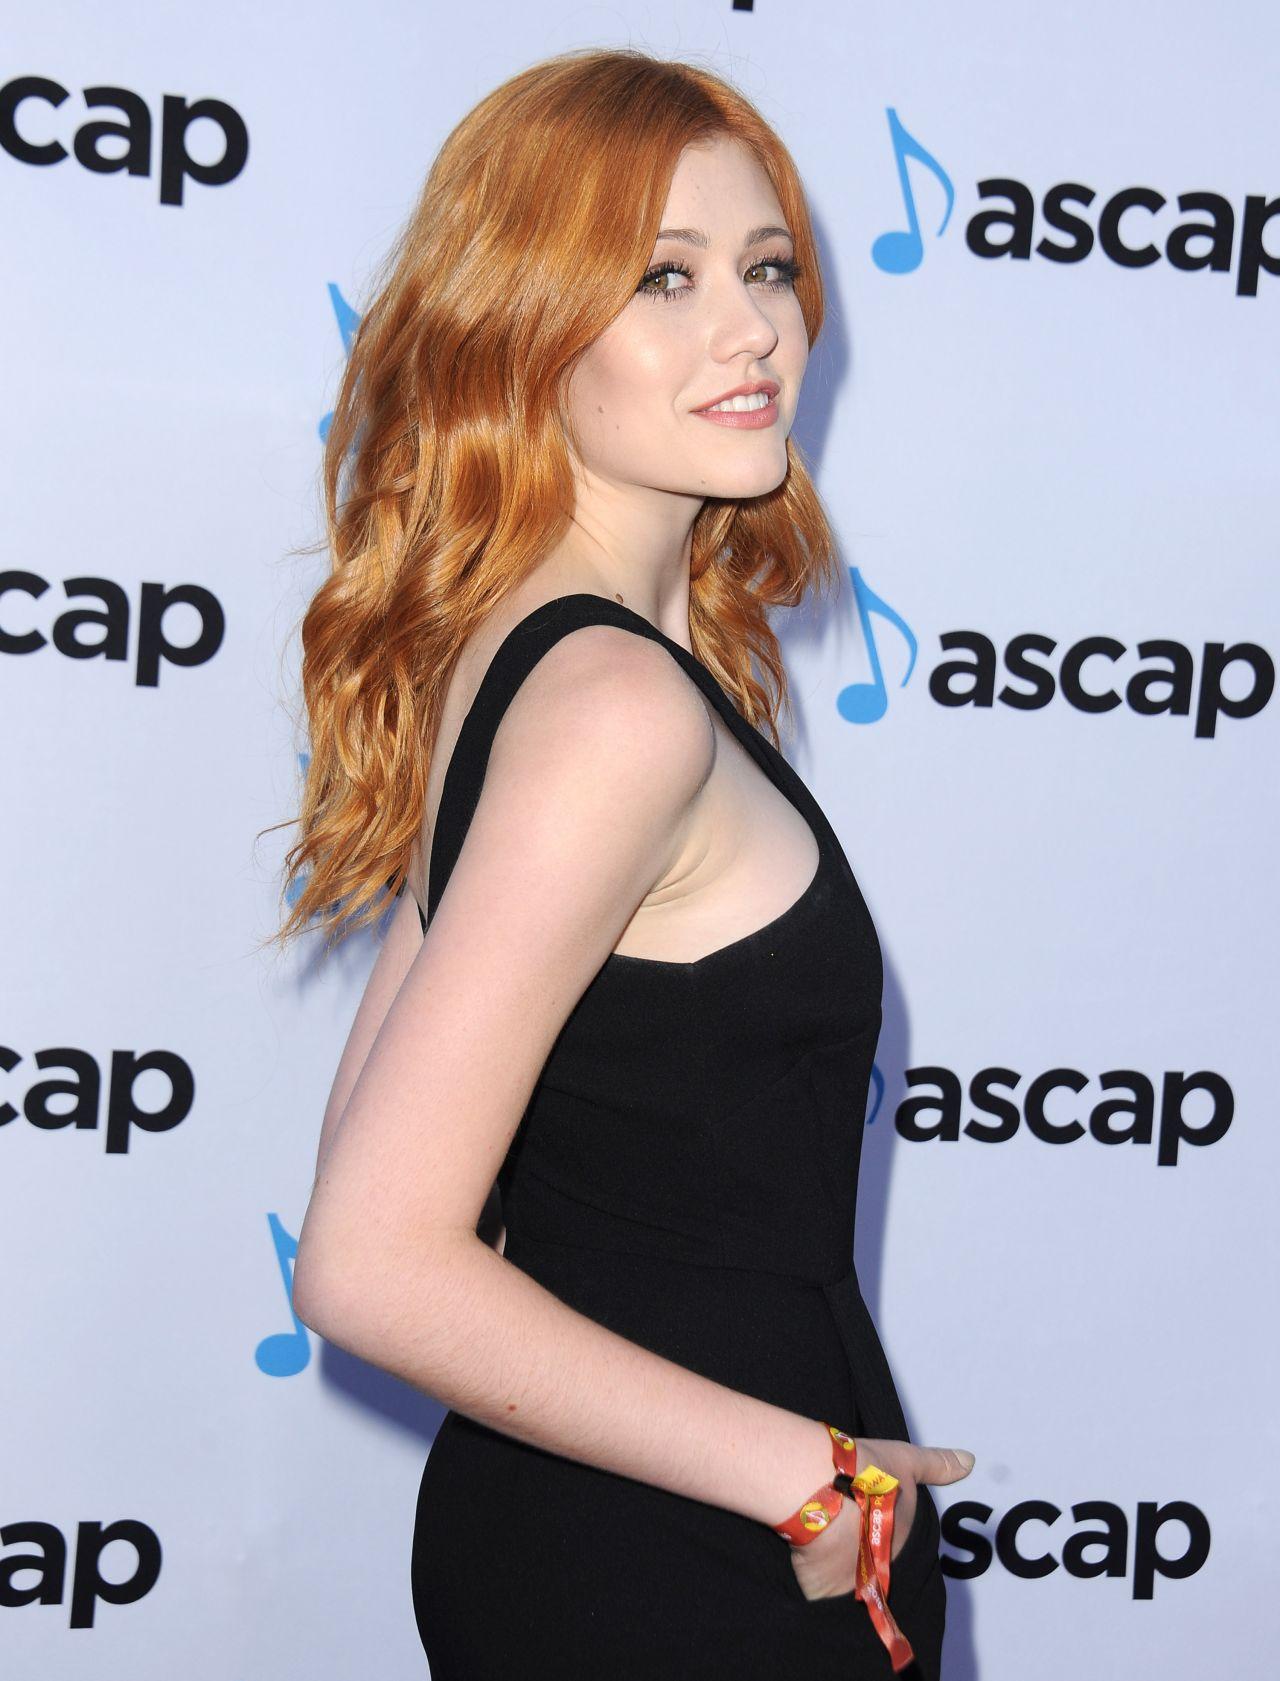 ASCAP 'Pop Award' For Richie Stephens   Entertainment ...